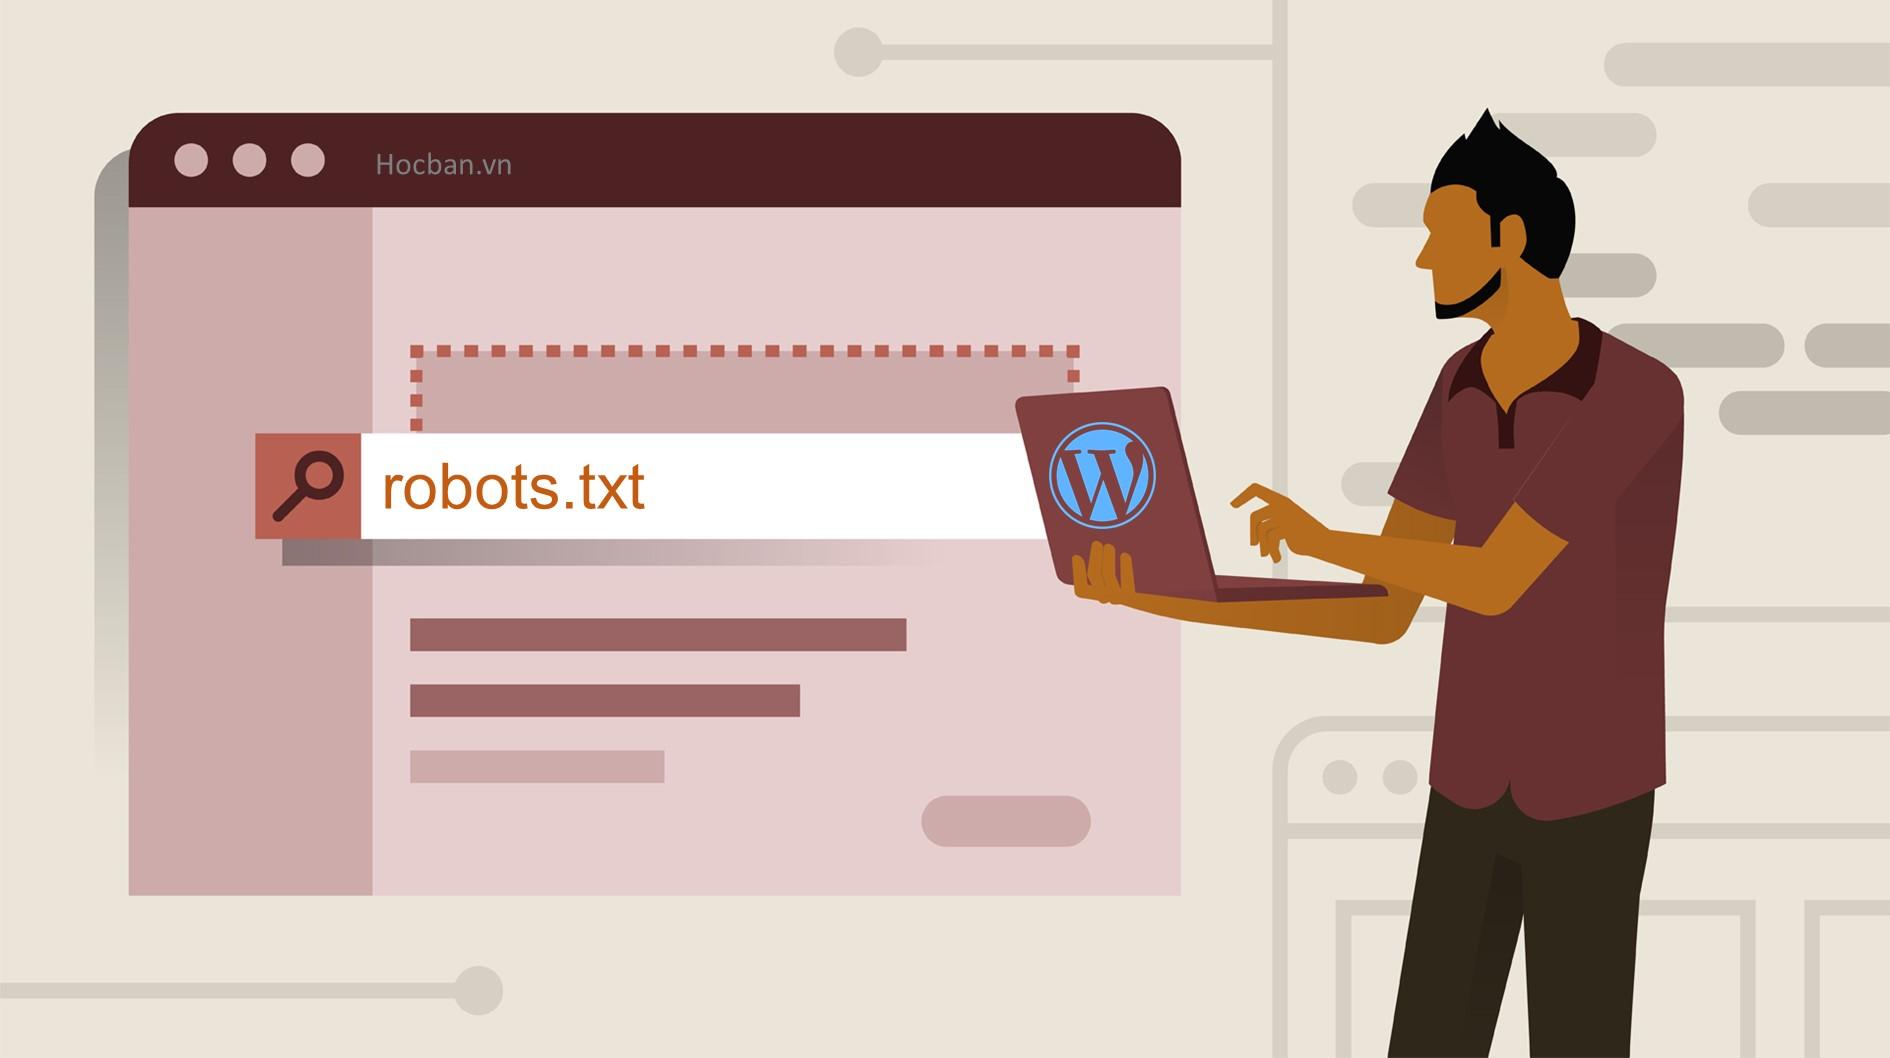 file robots.txt chuẩn cho wordpress